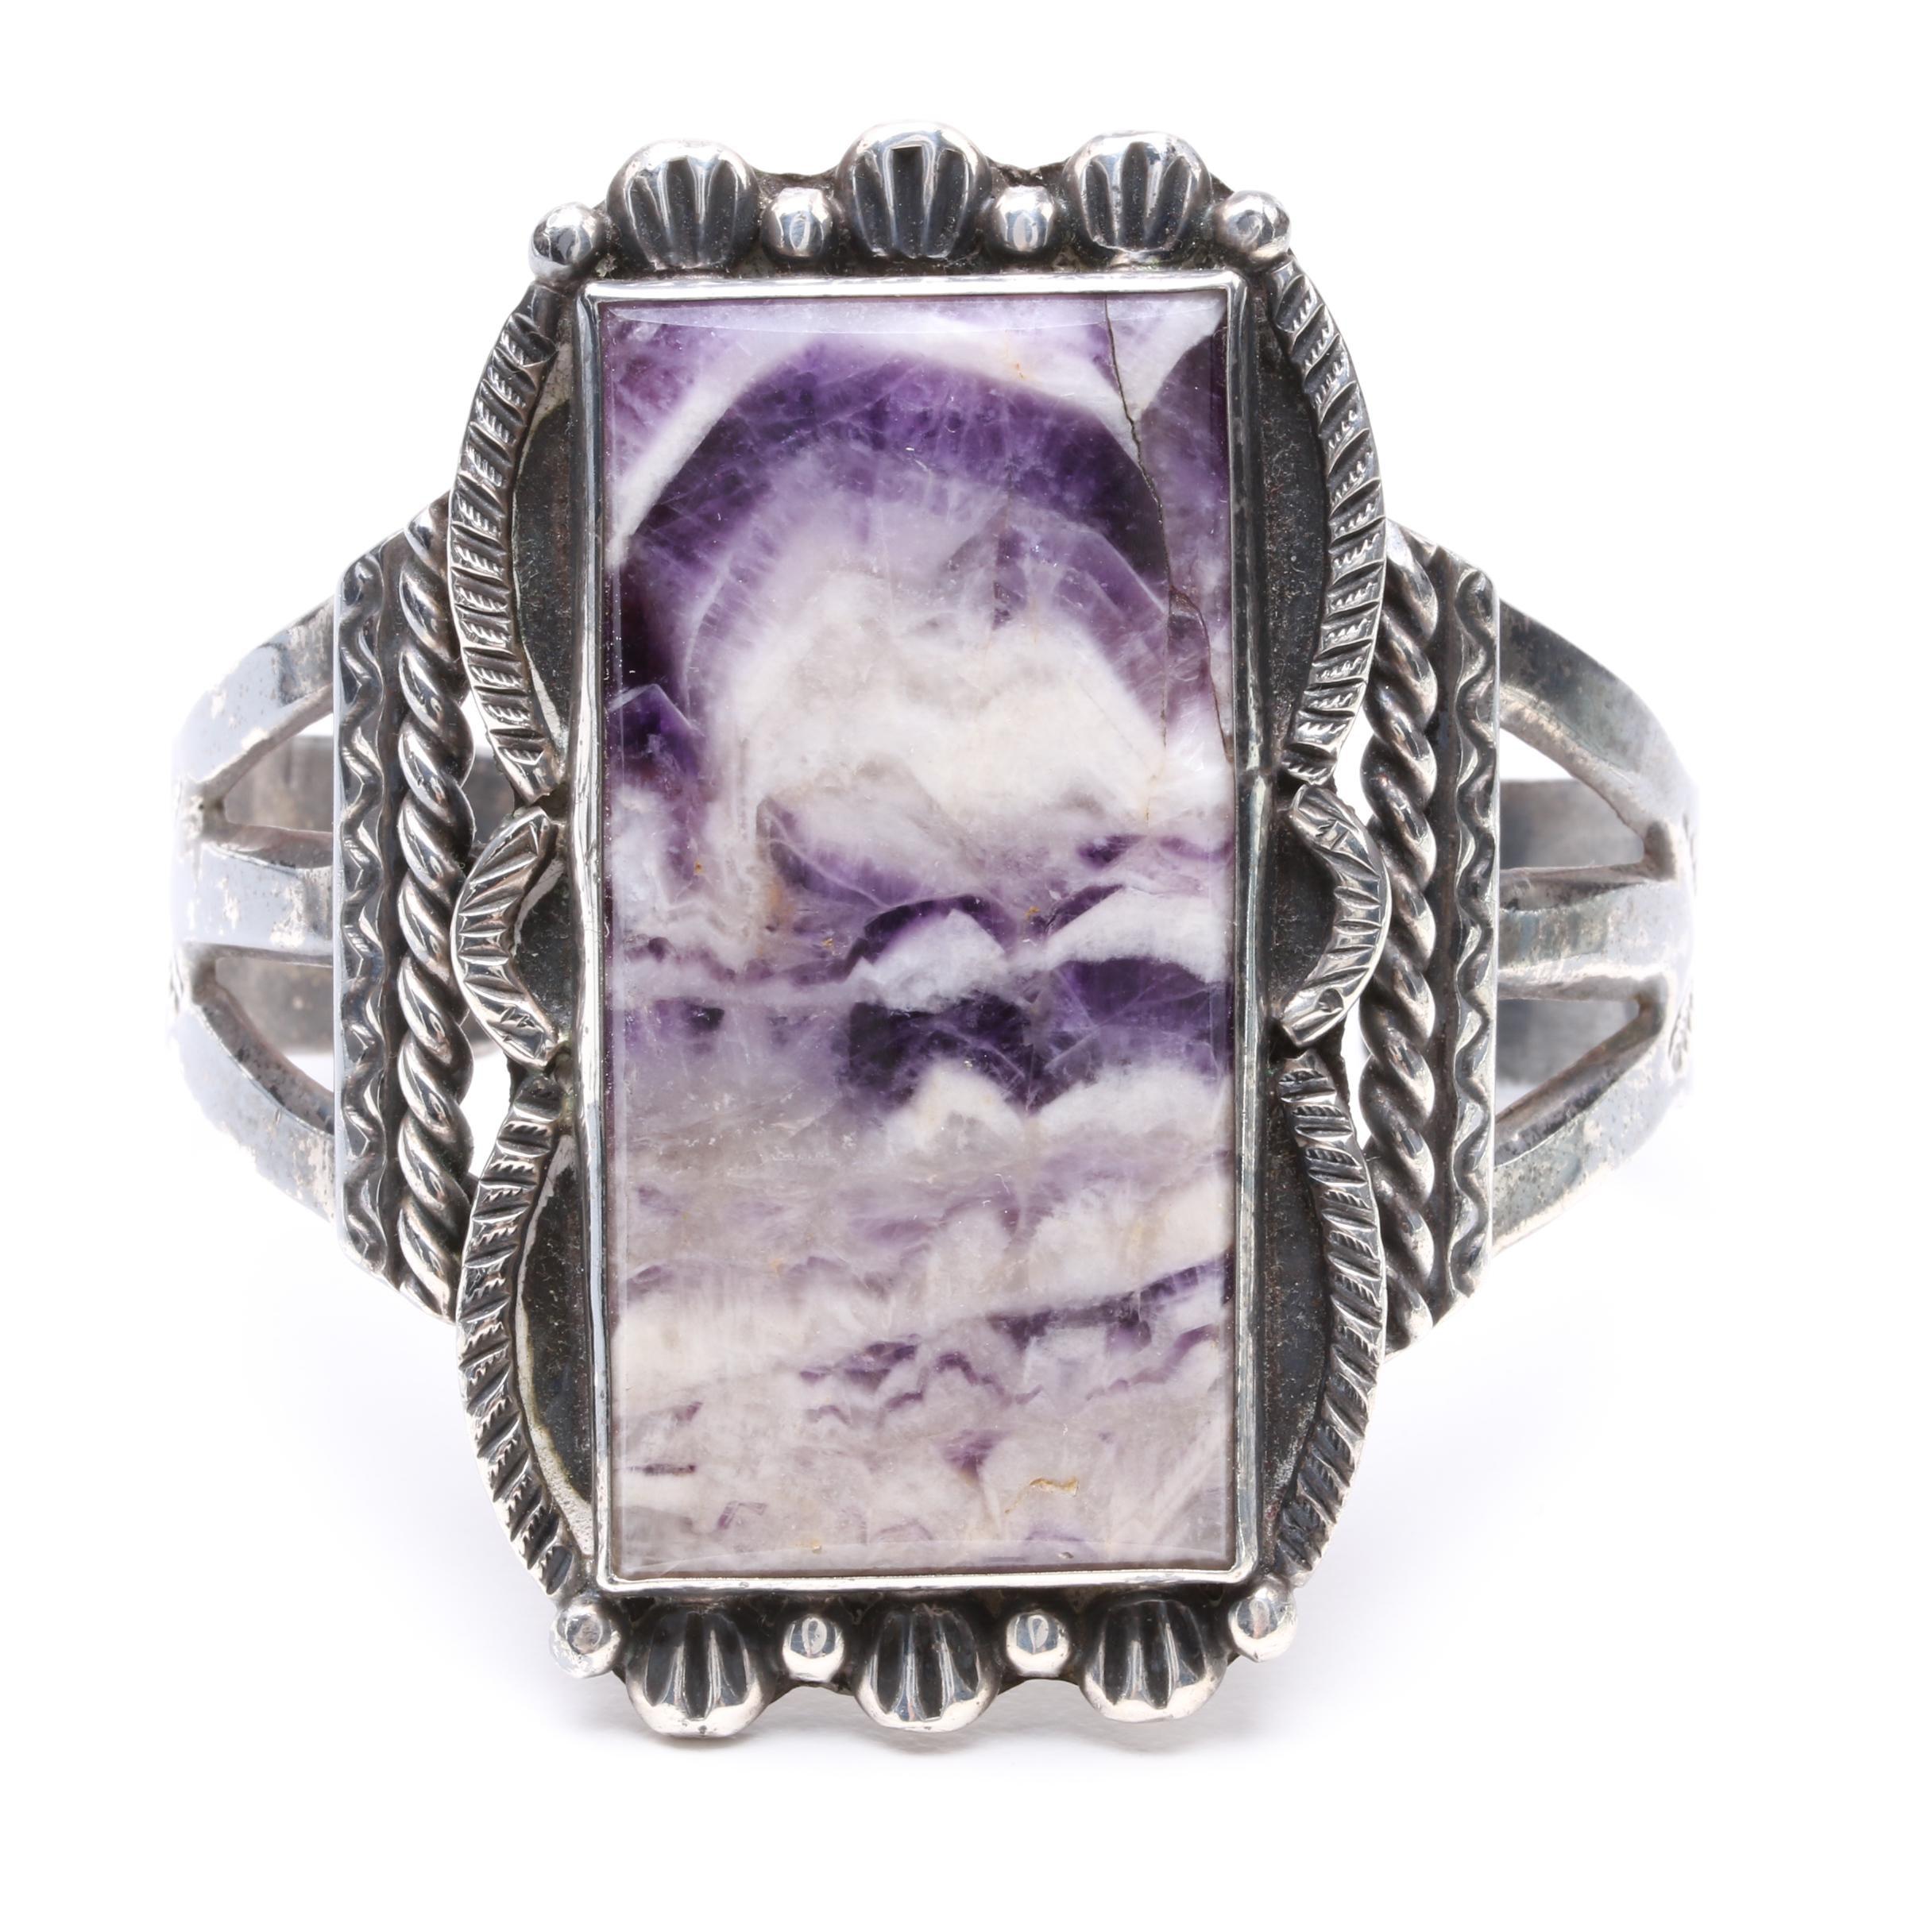 Vintage Handmade Sterling Silver Amethyst Cuff Bracelet